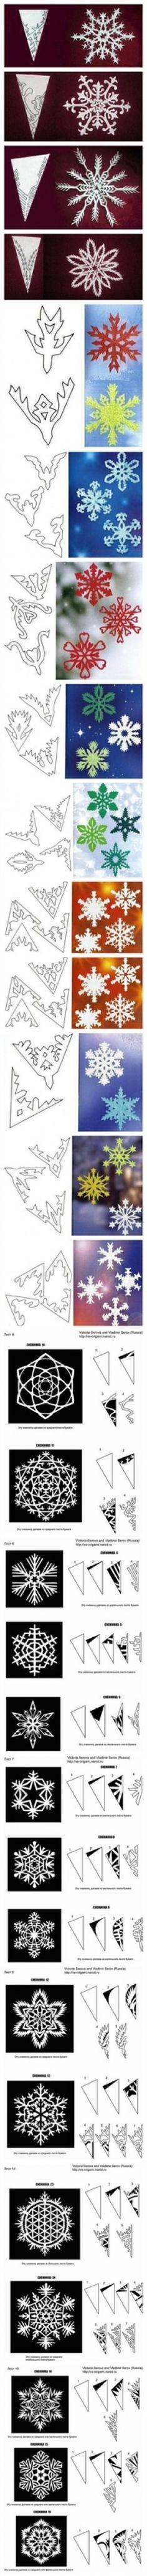 snowflake cheats!